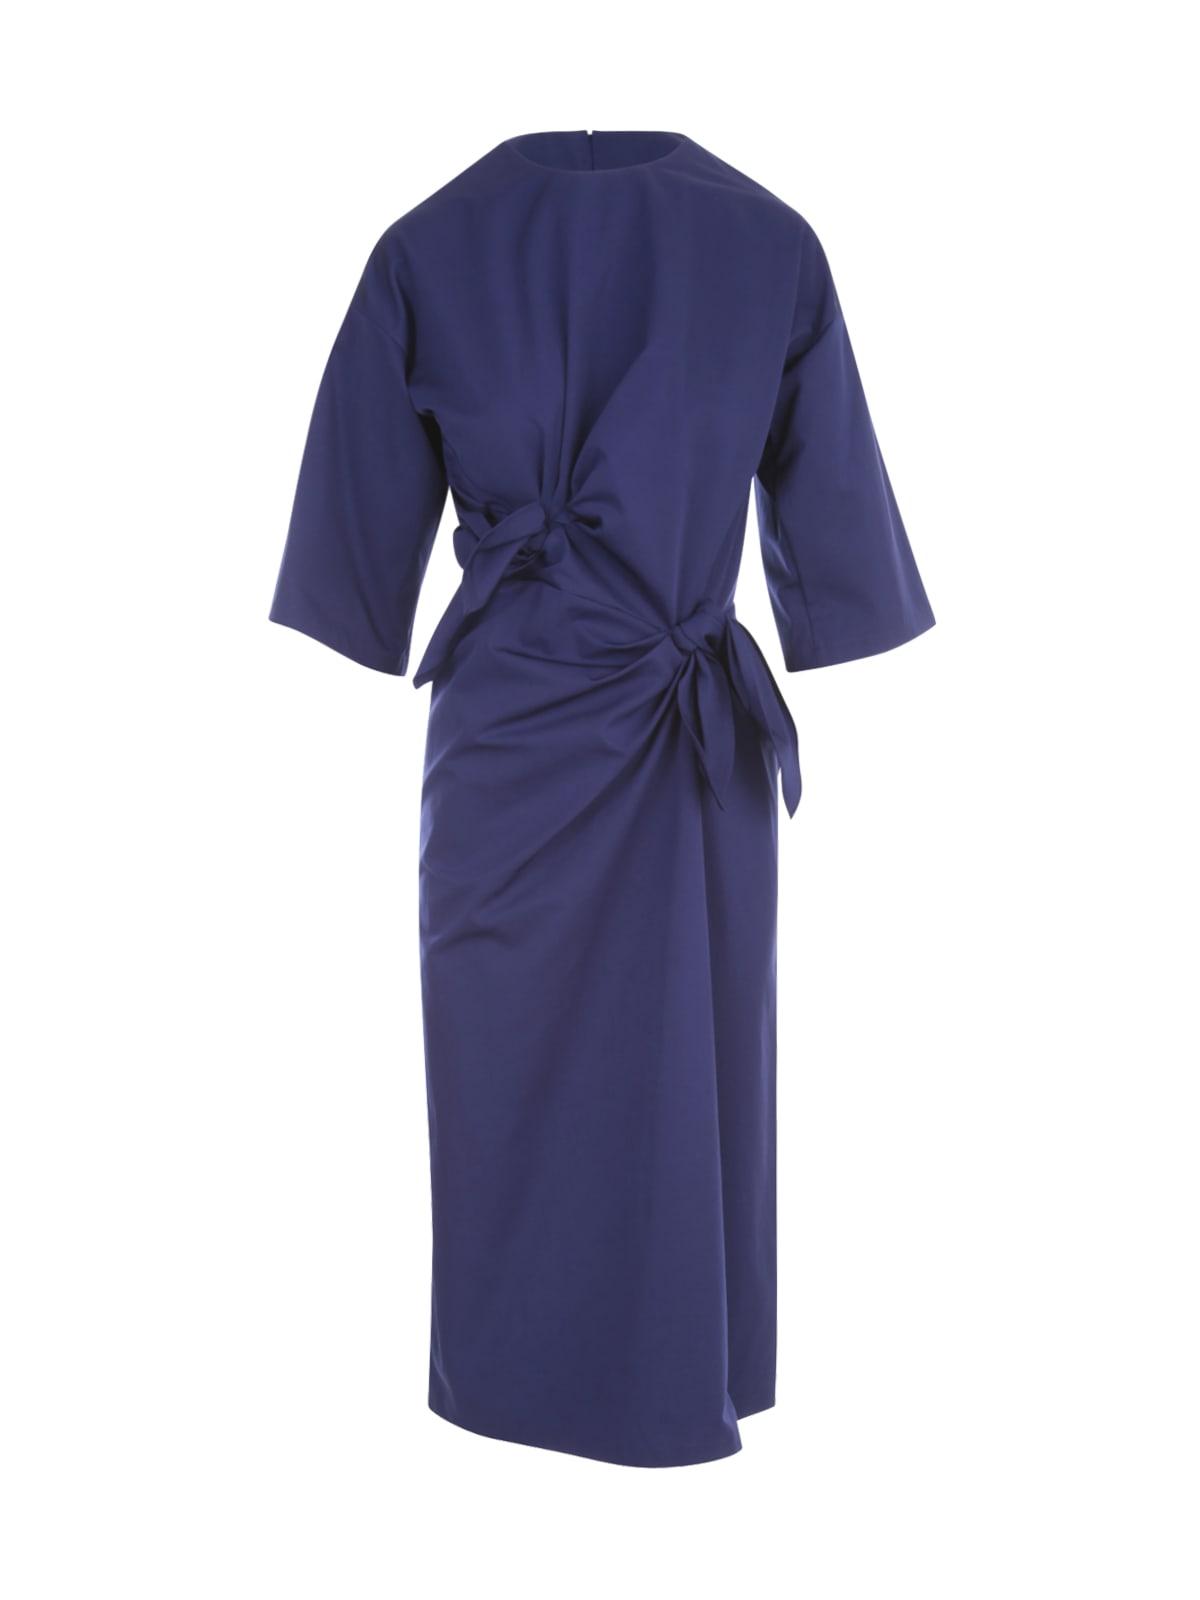 Long 3/4s Dress